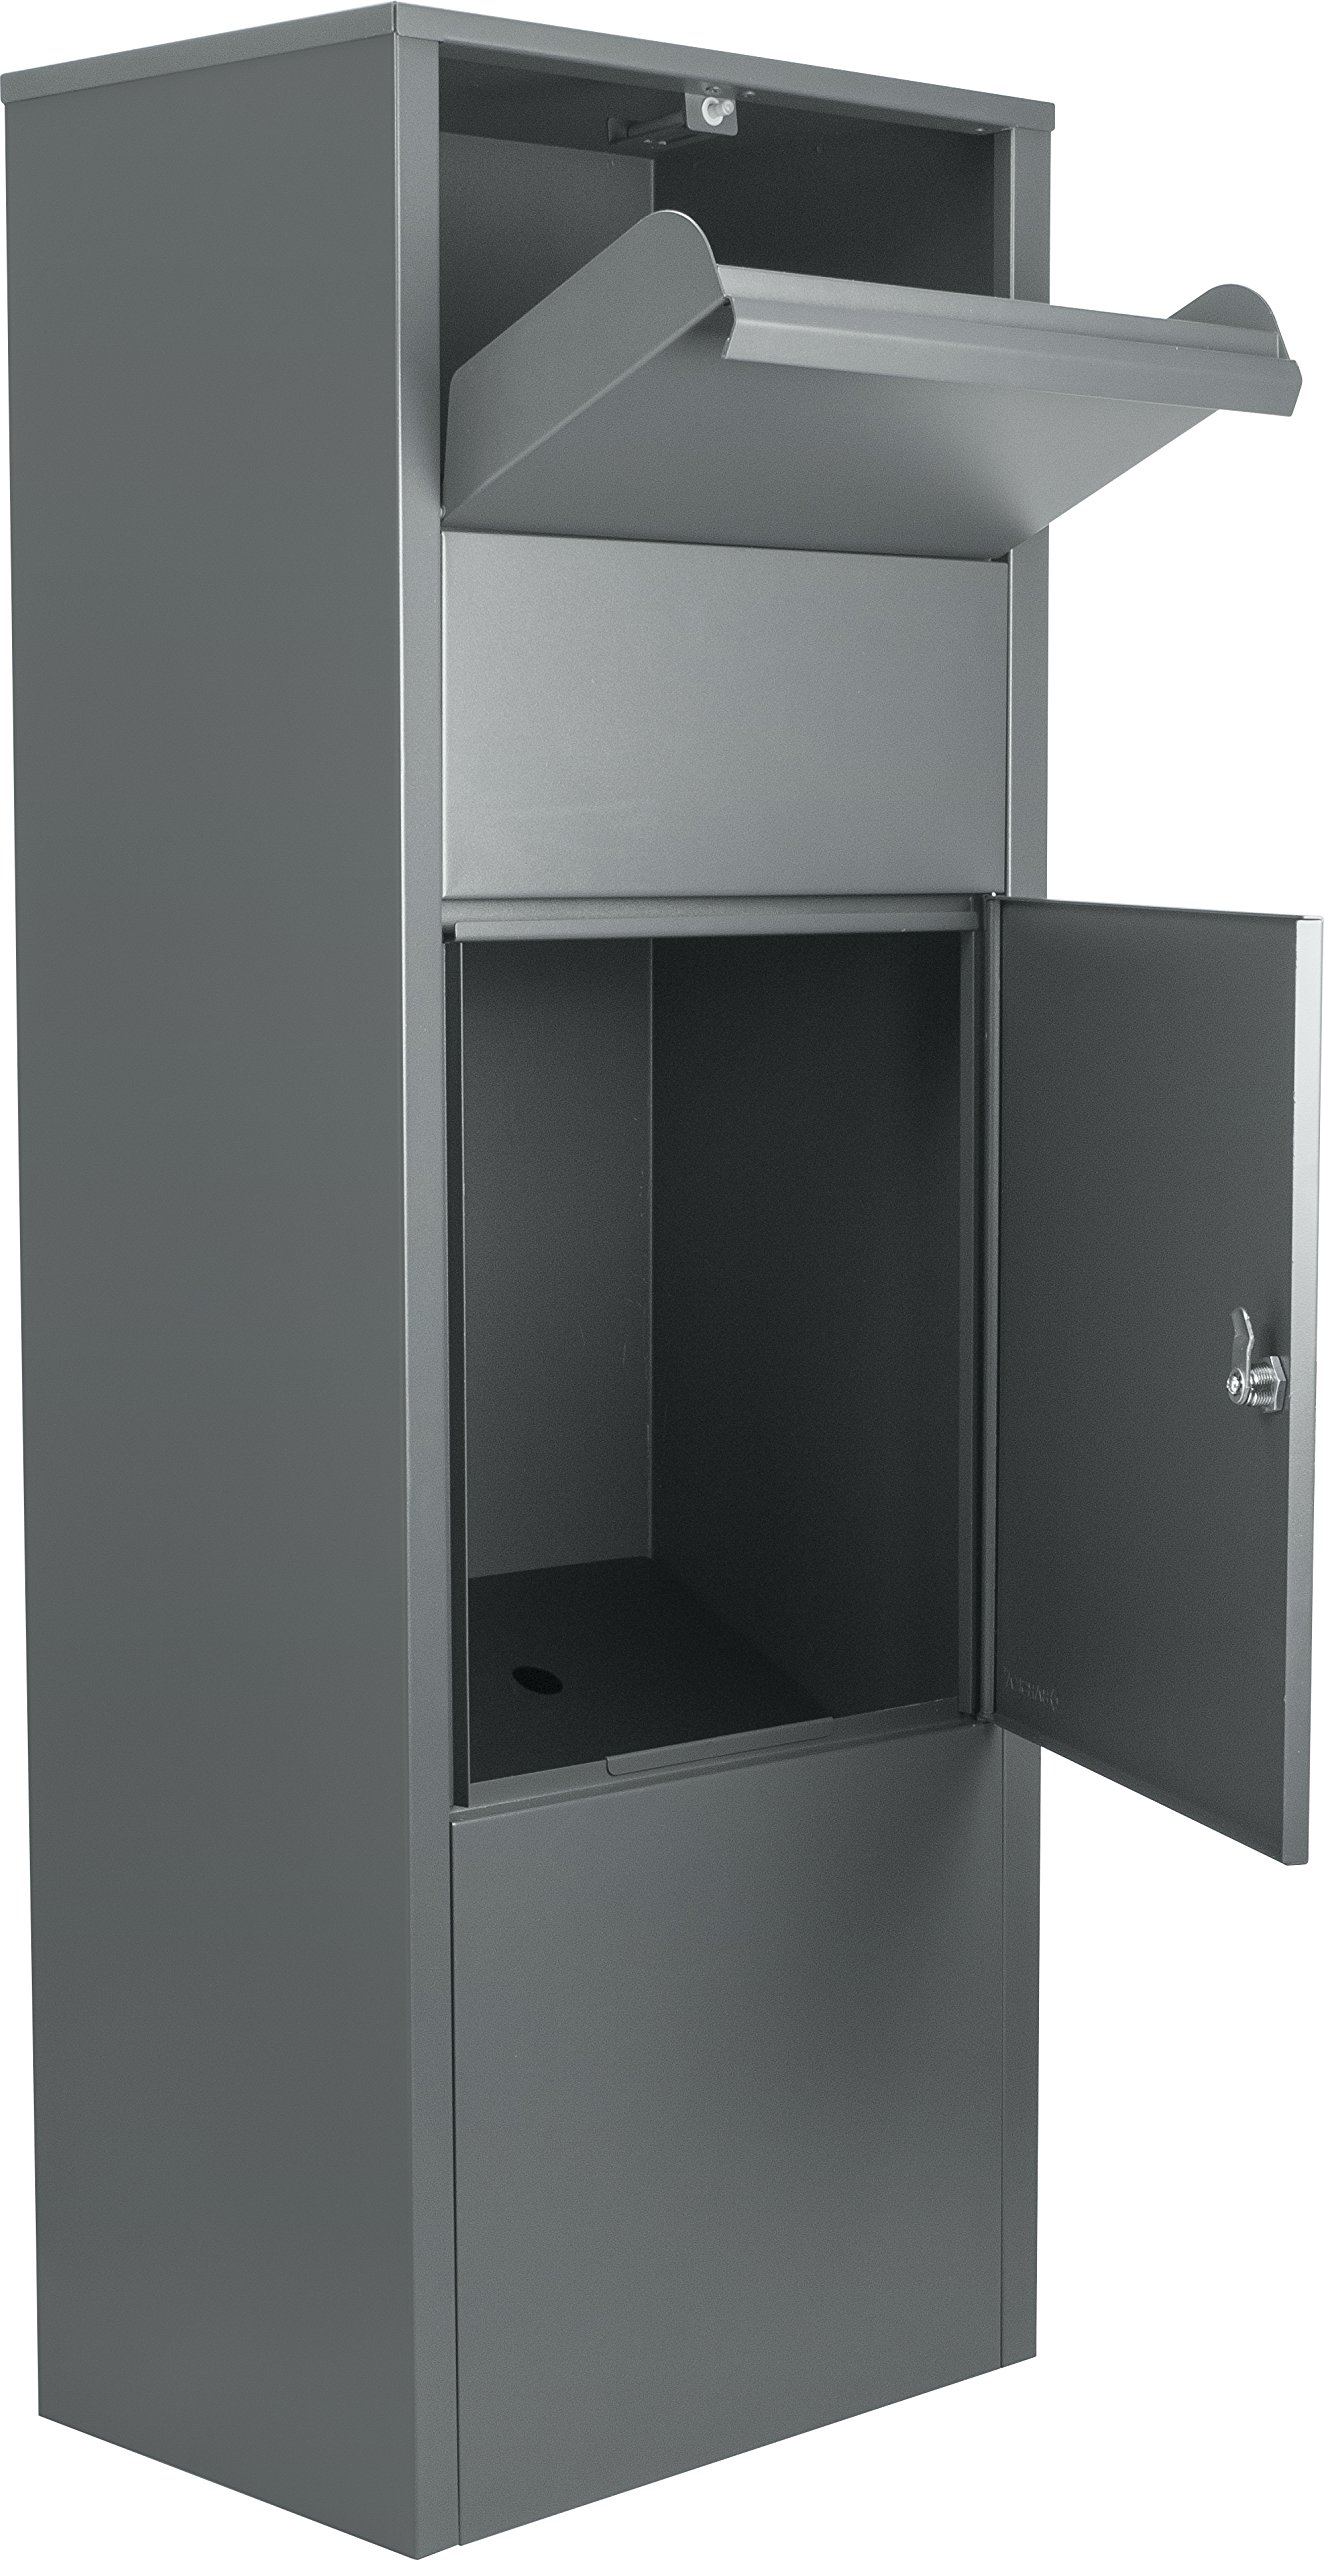 BARSKA Large Steel Freestanding Floor Parcel Lockable Drop Slot Mail Box, Grey